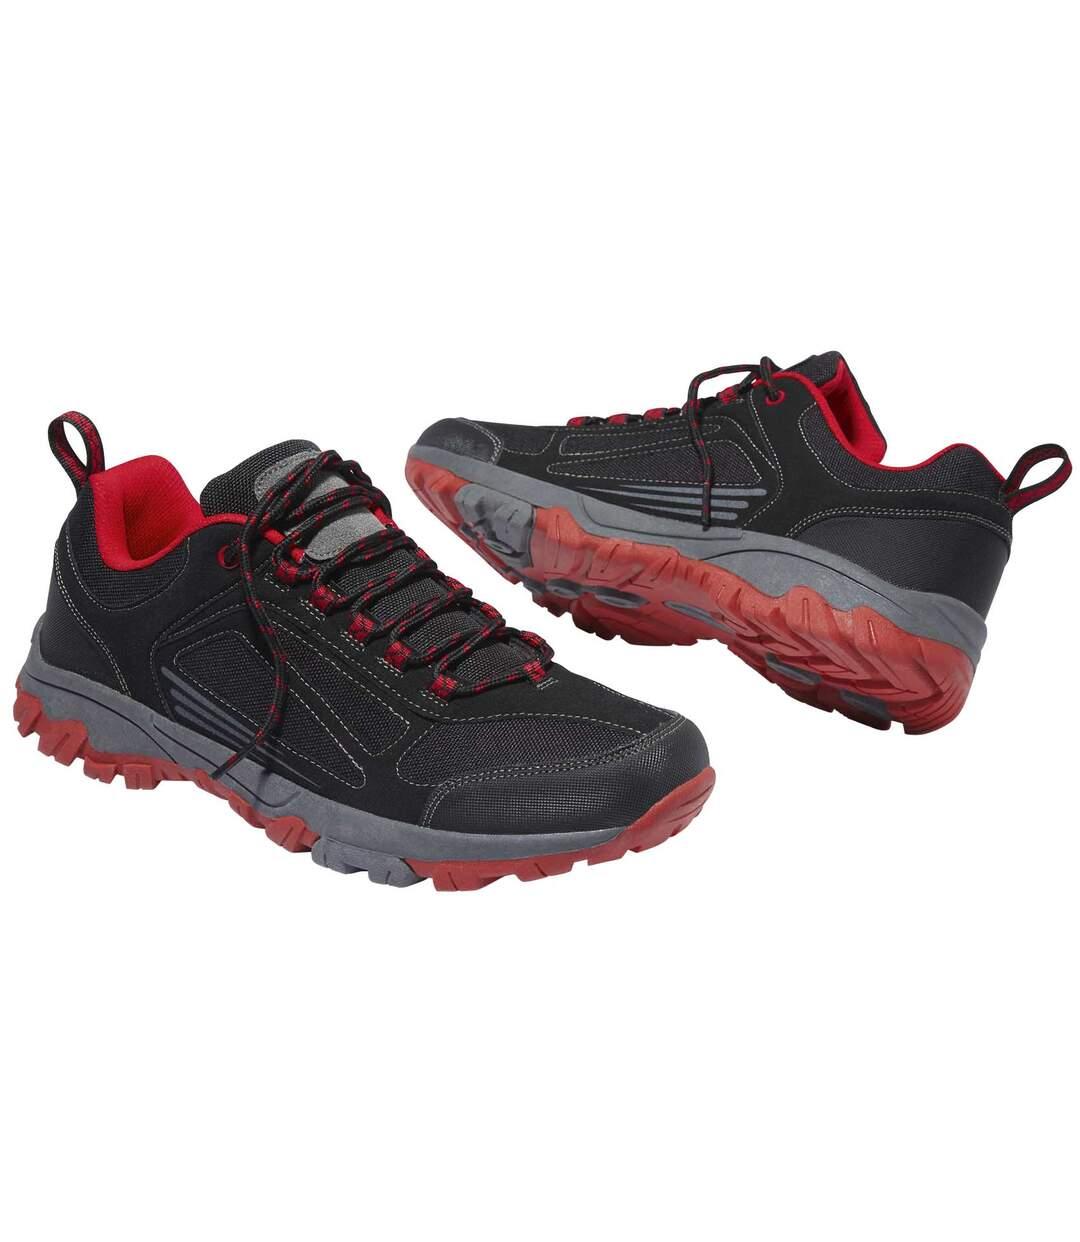 Chaussures Tout-Terrain Outdoor